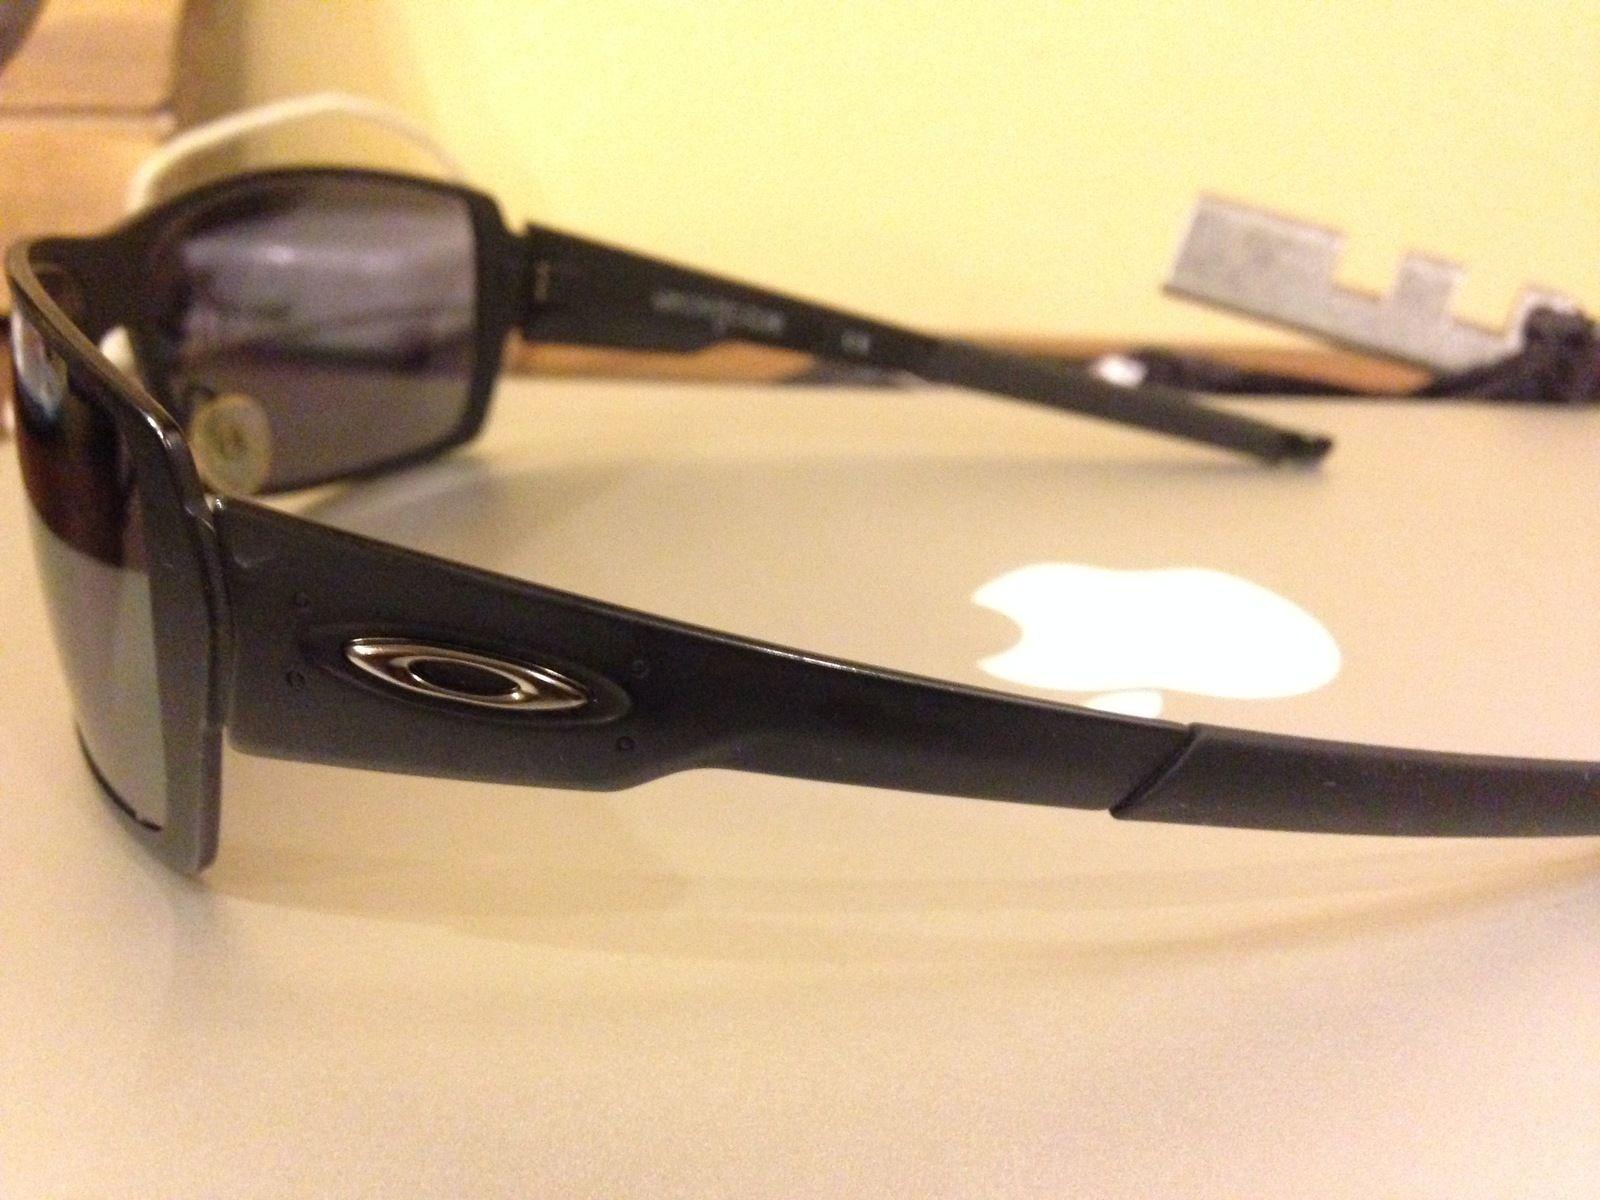 Spike Matte Black (Asian fit) - price drop - zuYmE7N.jpg